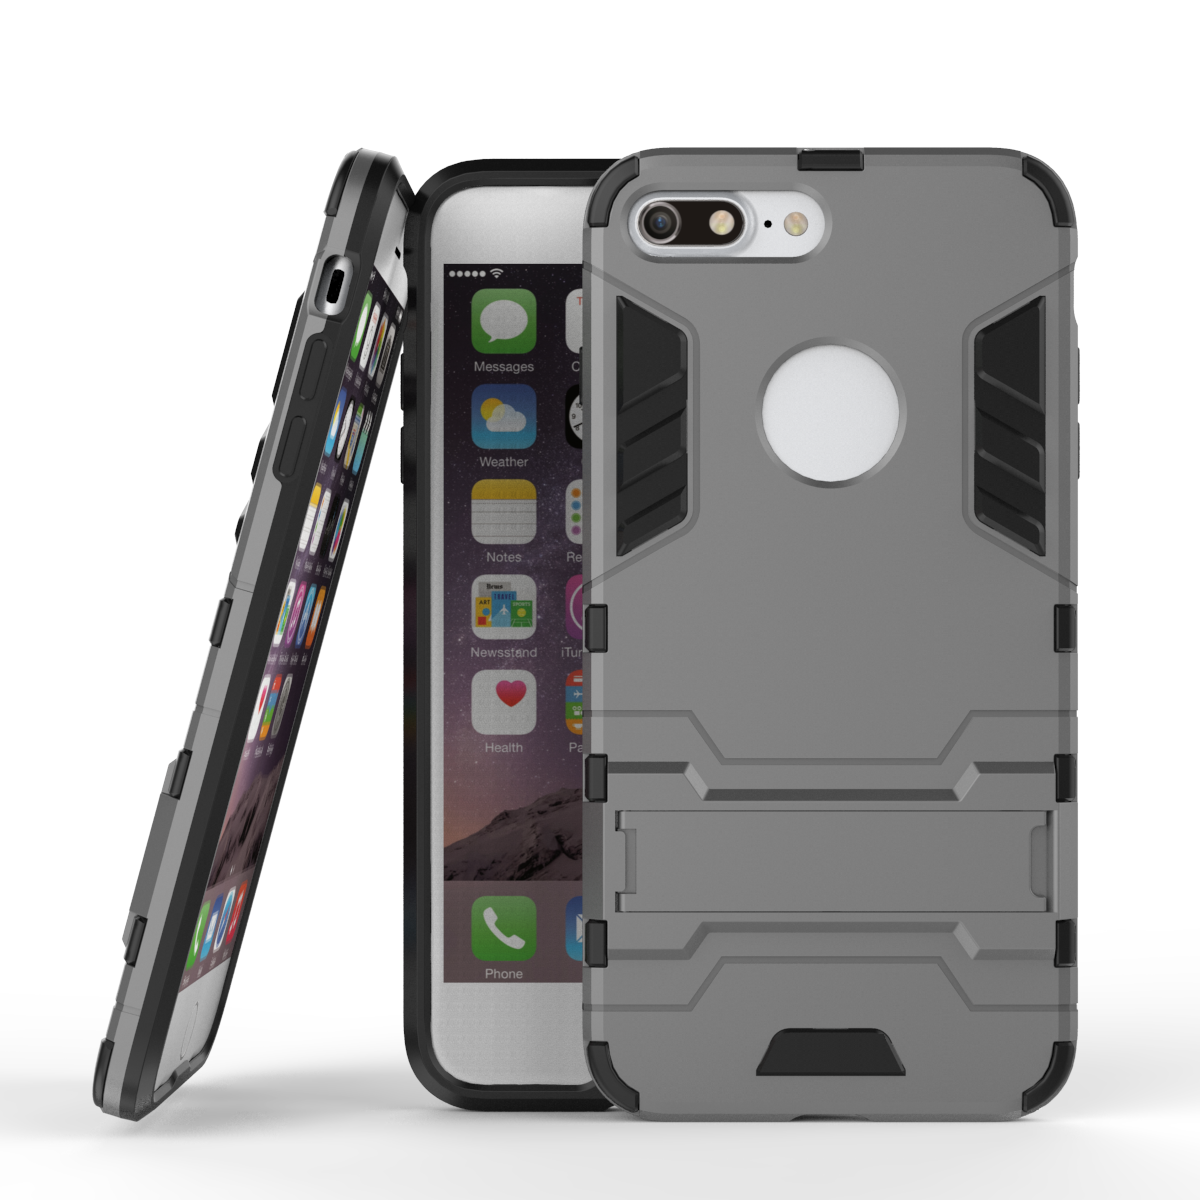 Untuk iPhone 7 Ditambah Kasus Tugas berat Armor Kasus Hybrid Keras  Shockproof Silicon Karet Kasus Telepon Cover Untuk Apple iPhone 7 Ditambah  5.5 5baf1ef2a7